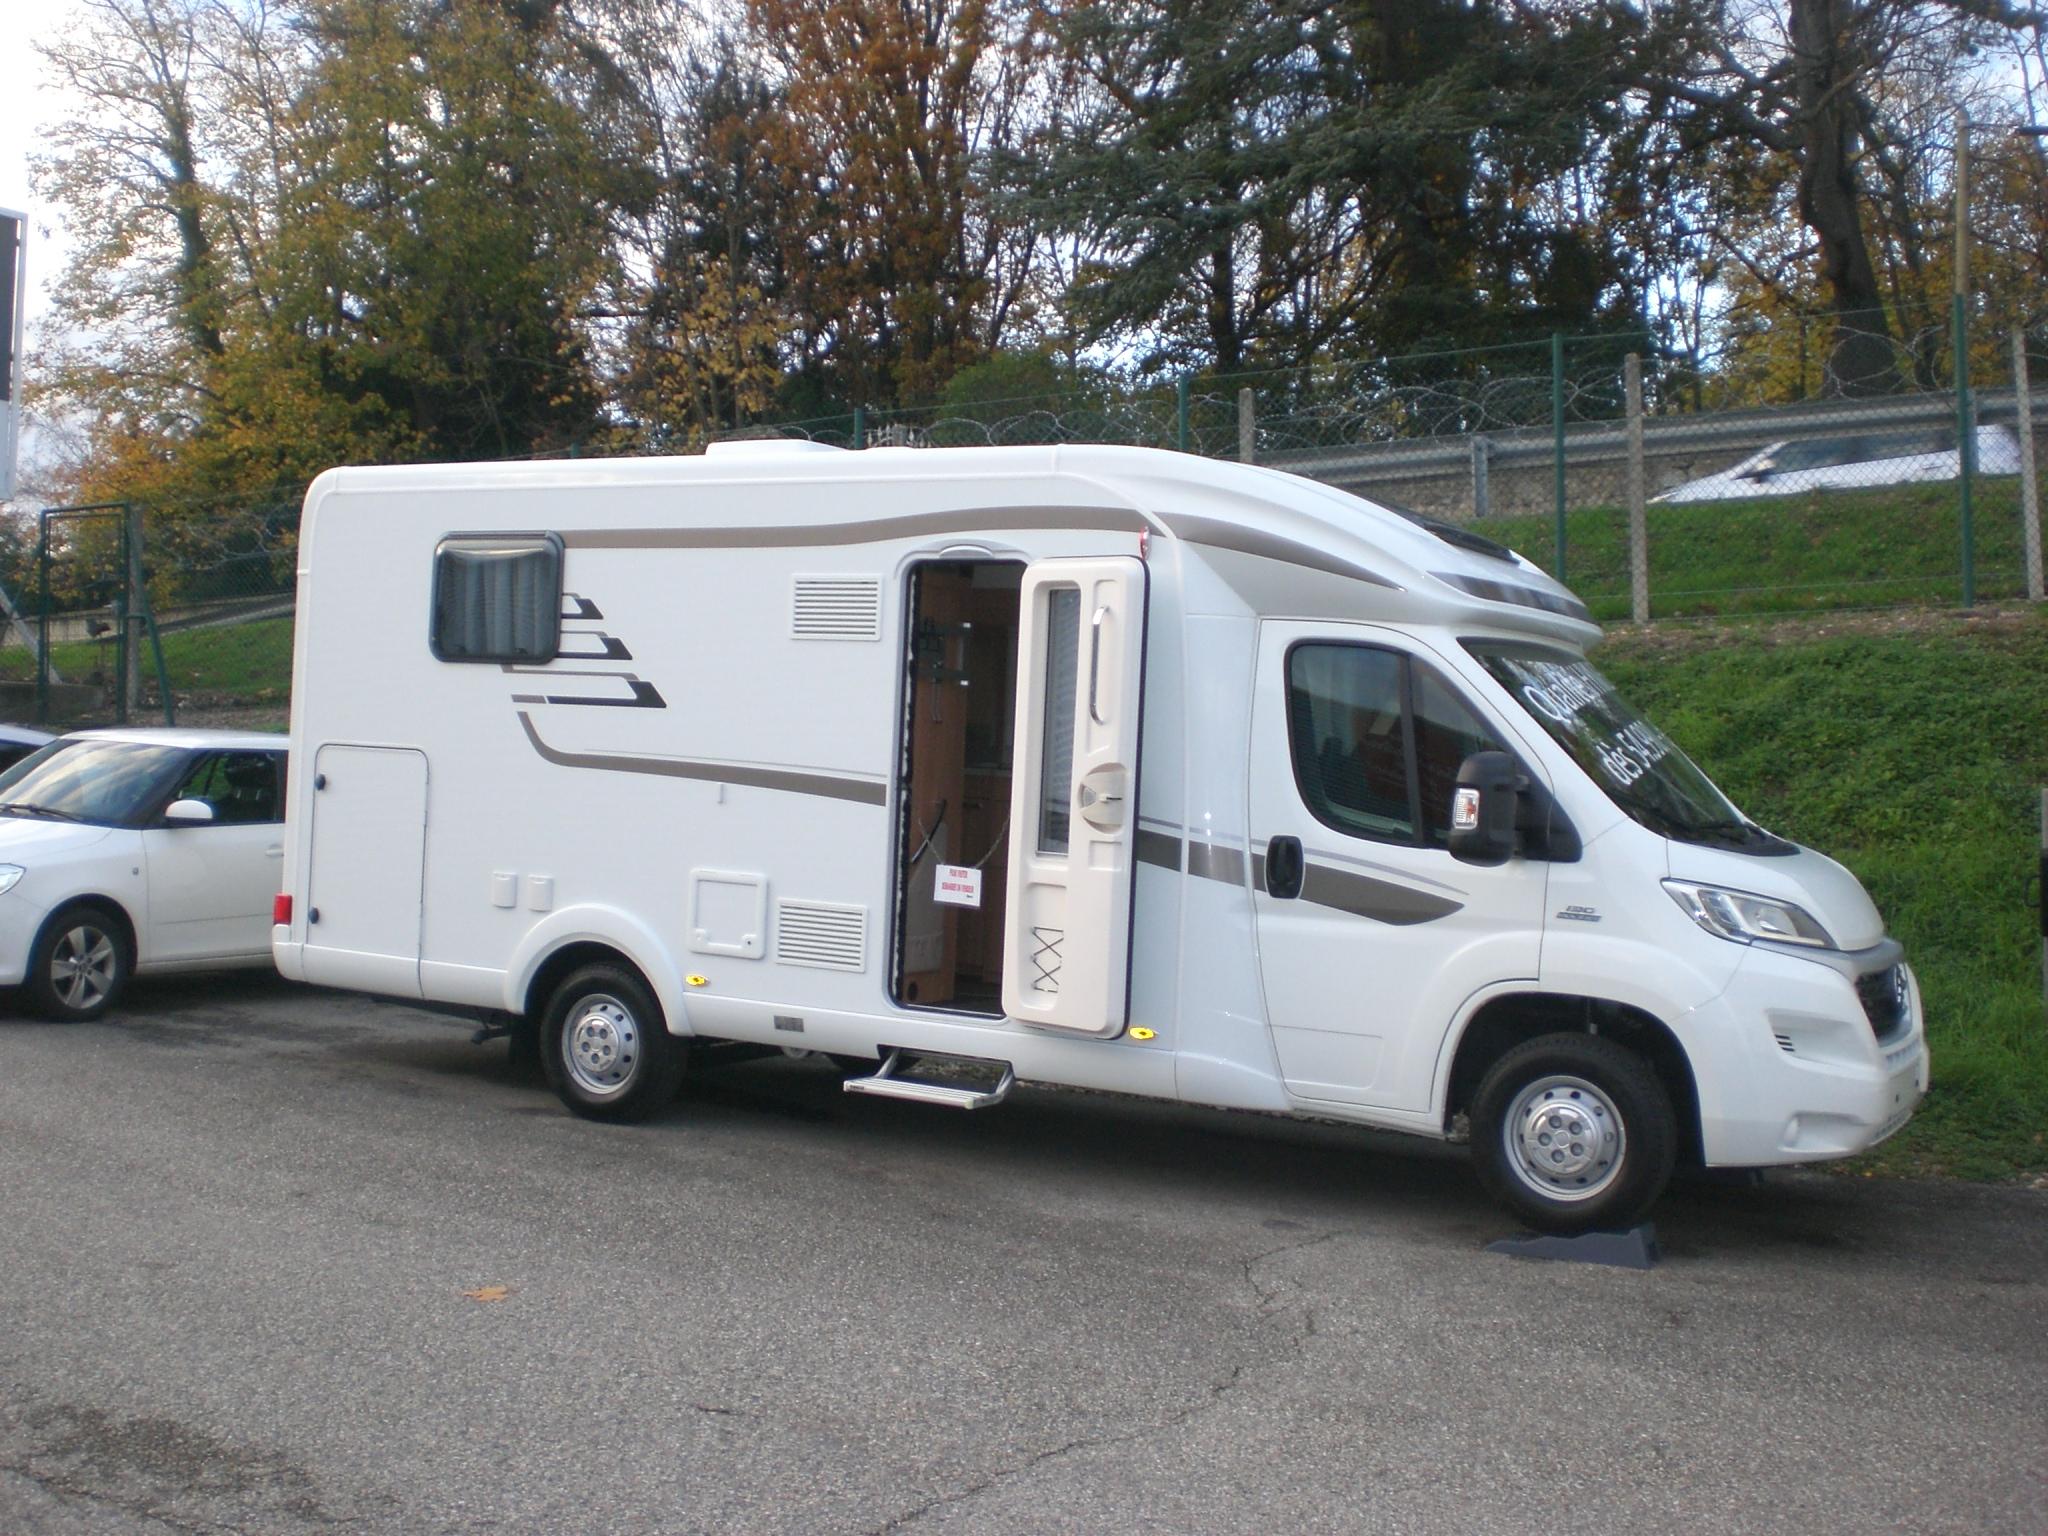 hymer tramp 598 gl neuf de 2016 fiat camping car en vente l 39 etrat loire 42. Black Bedroom Furniture Sets. Home Design Ideas